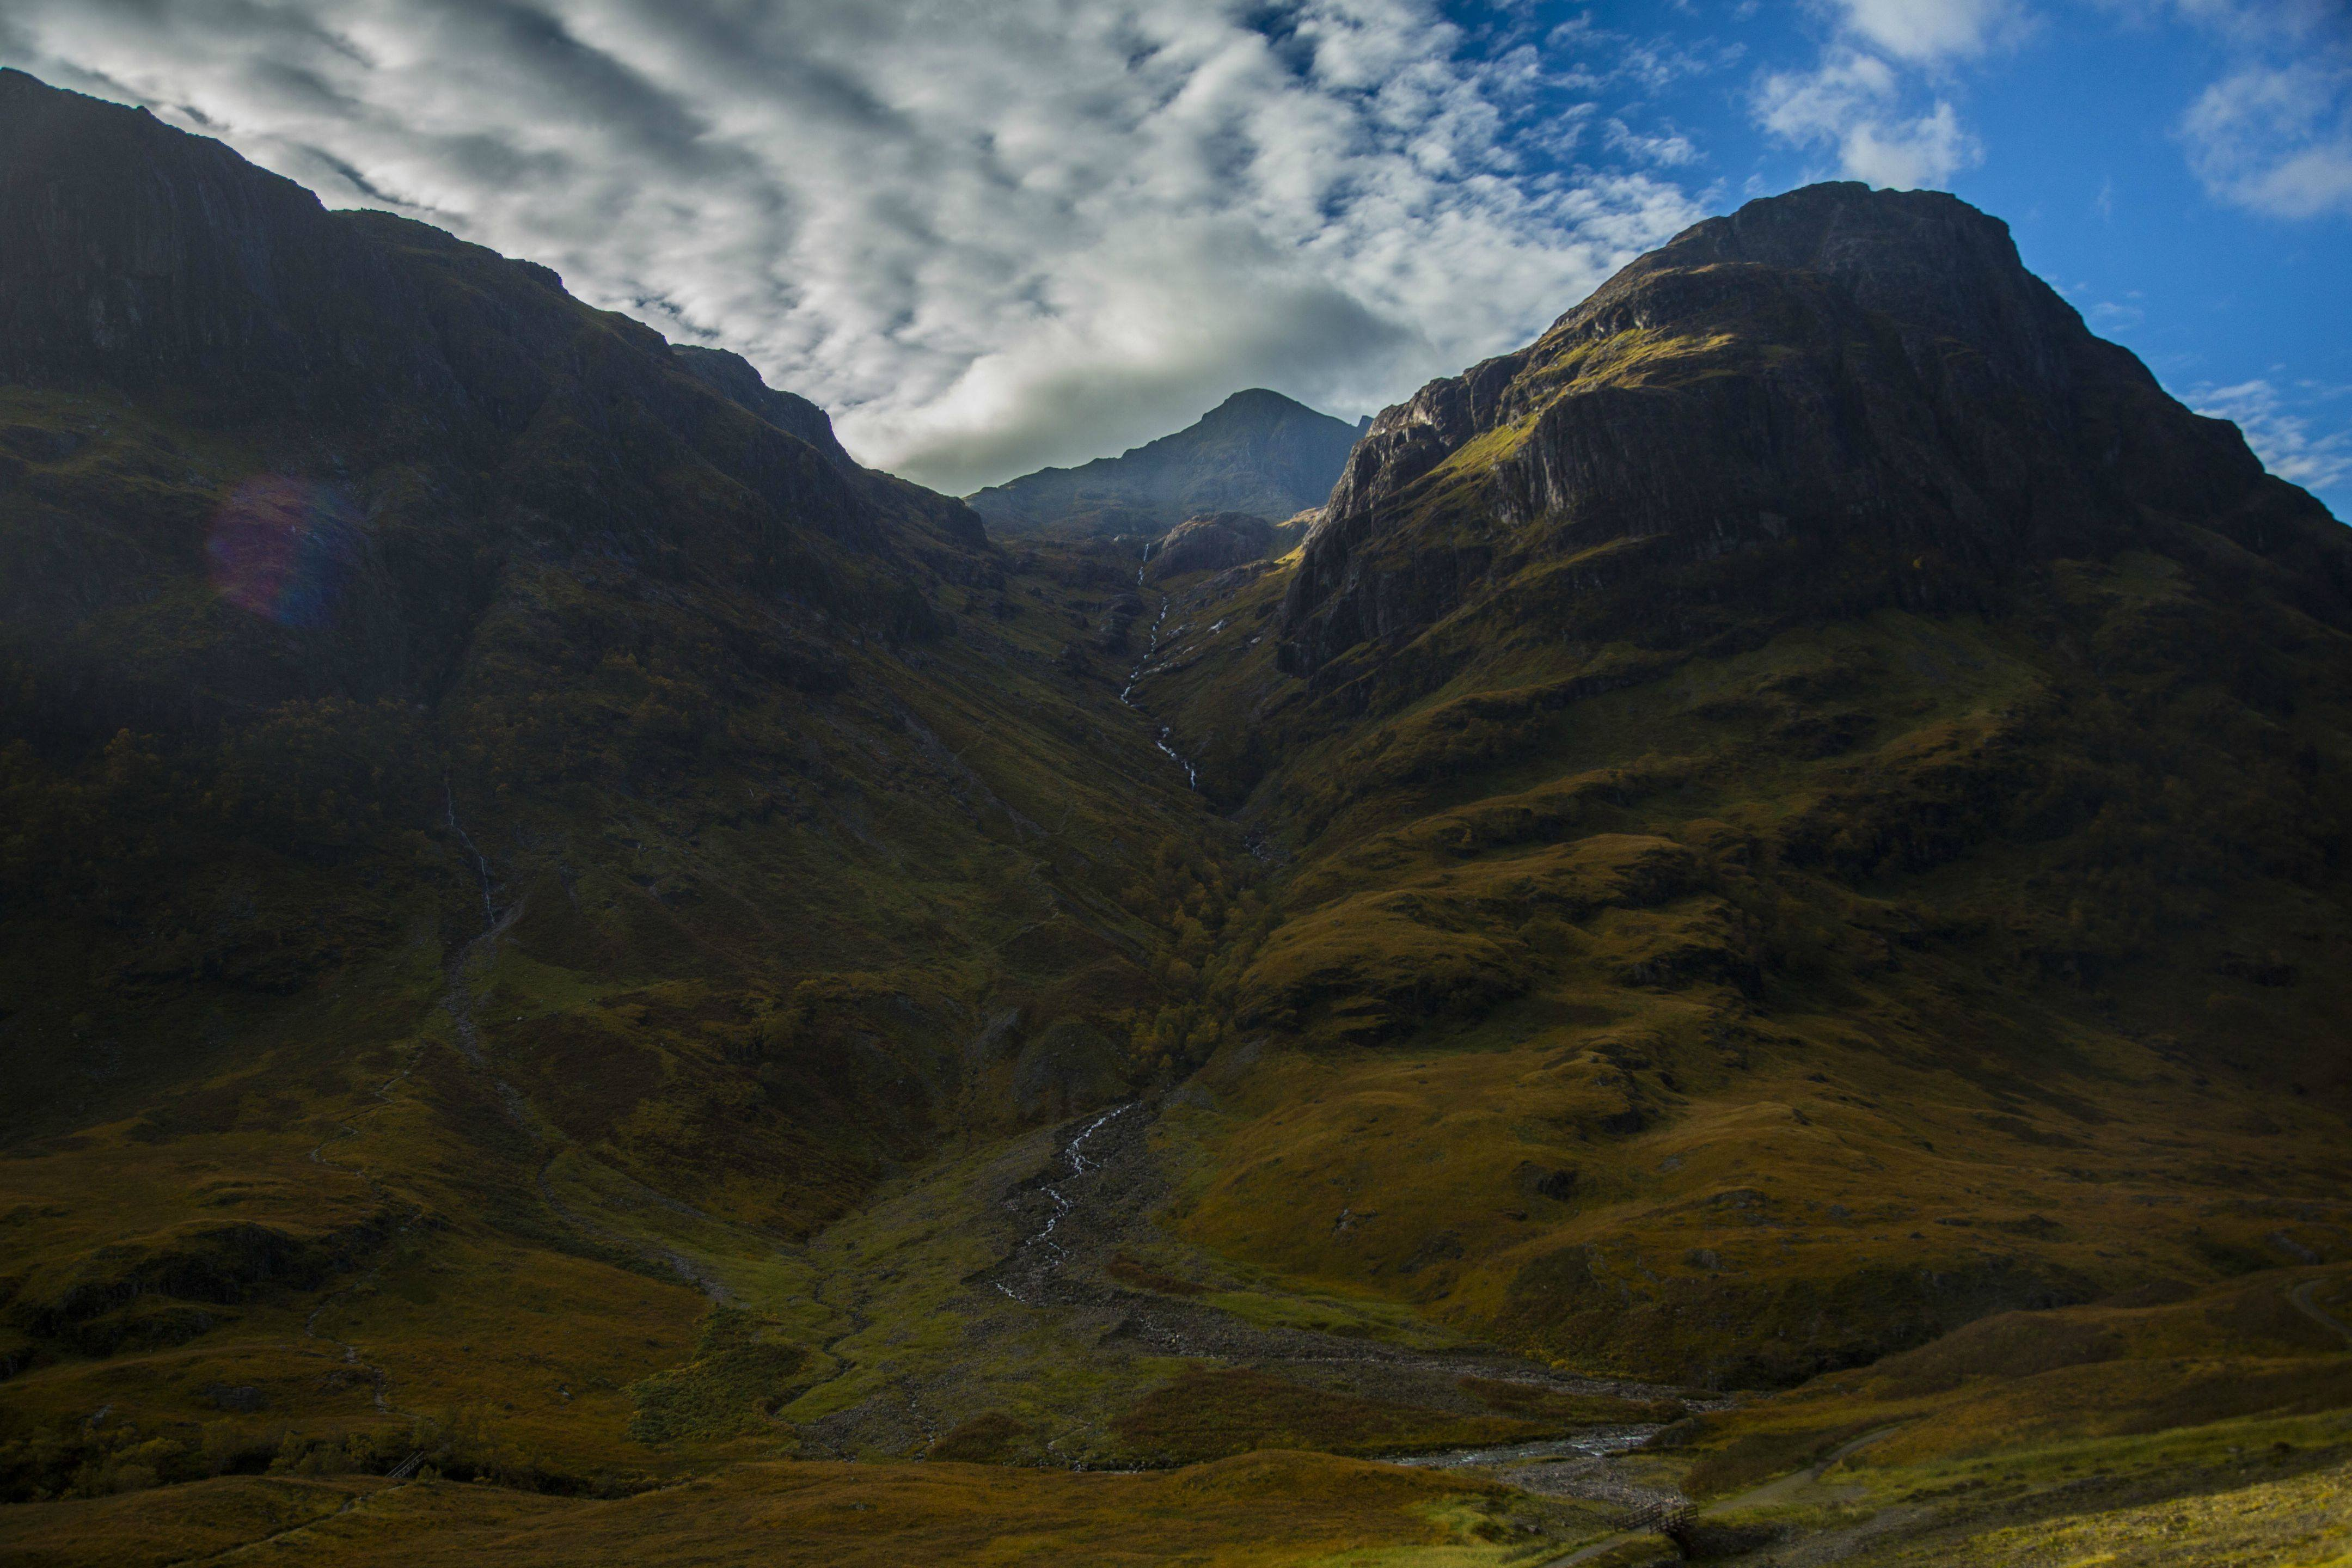 Scotland wallpapers and desktop backgrounds up to 8k - Scotland wallpaper ...